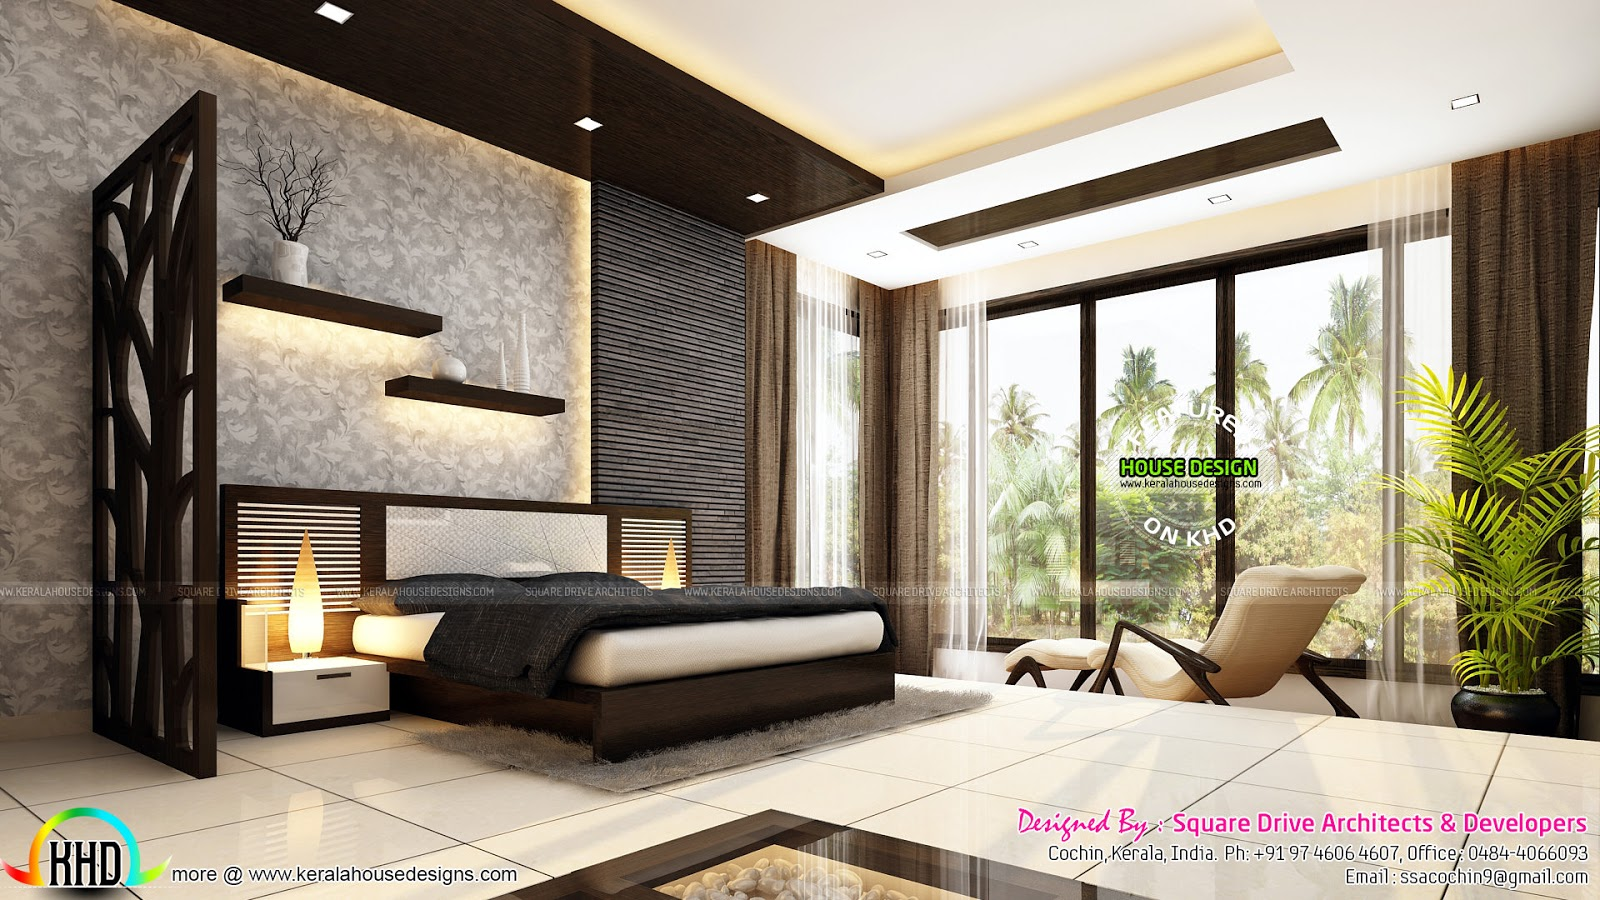 Very beautiful modern interior designs